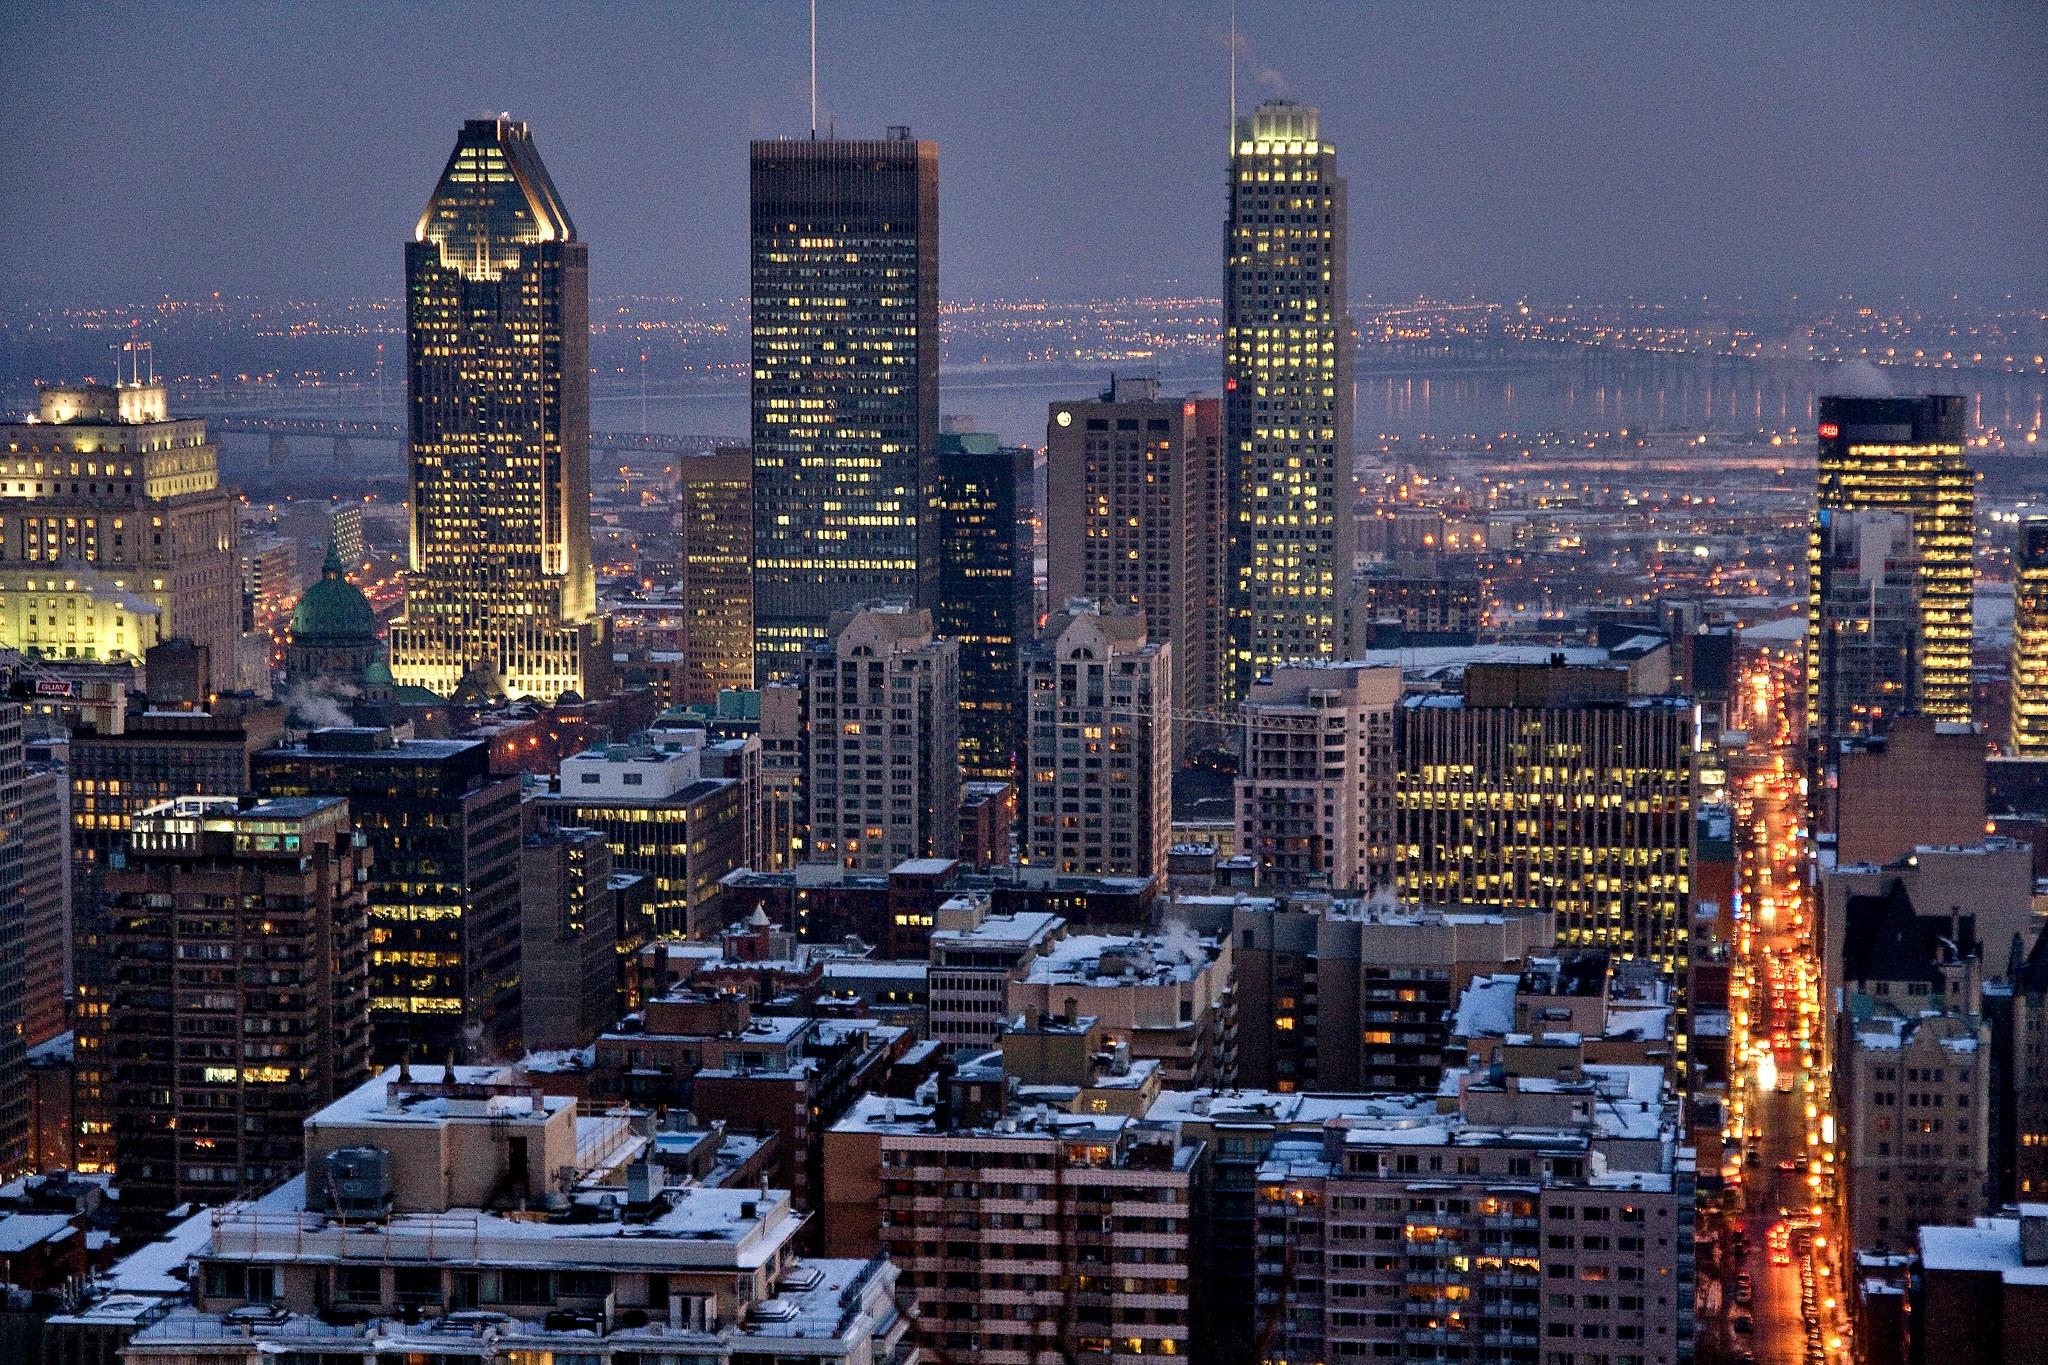 Startups in Montreal: $700 million in economic benefits